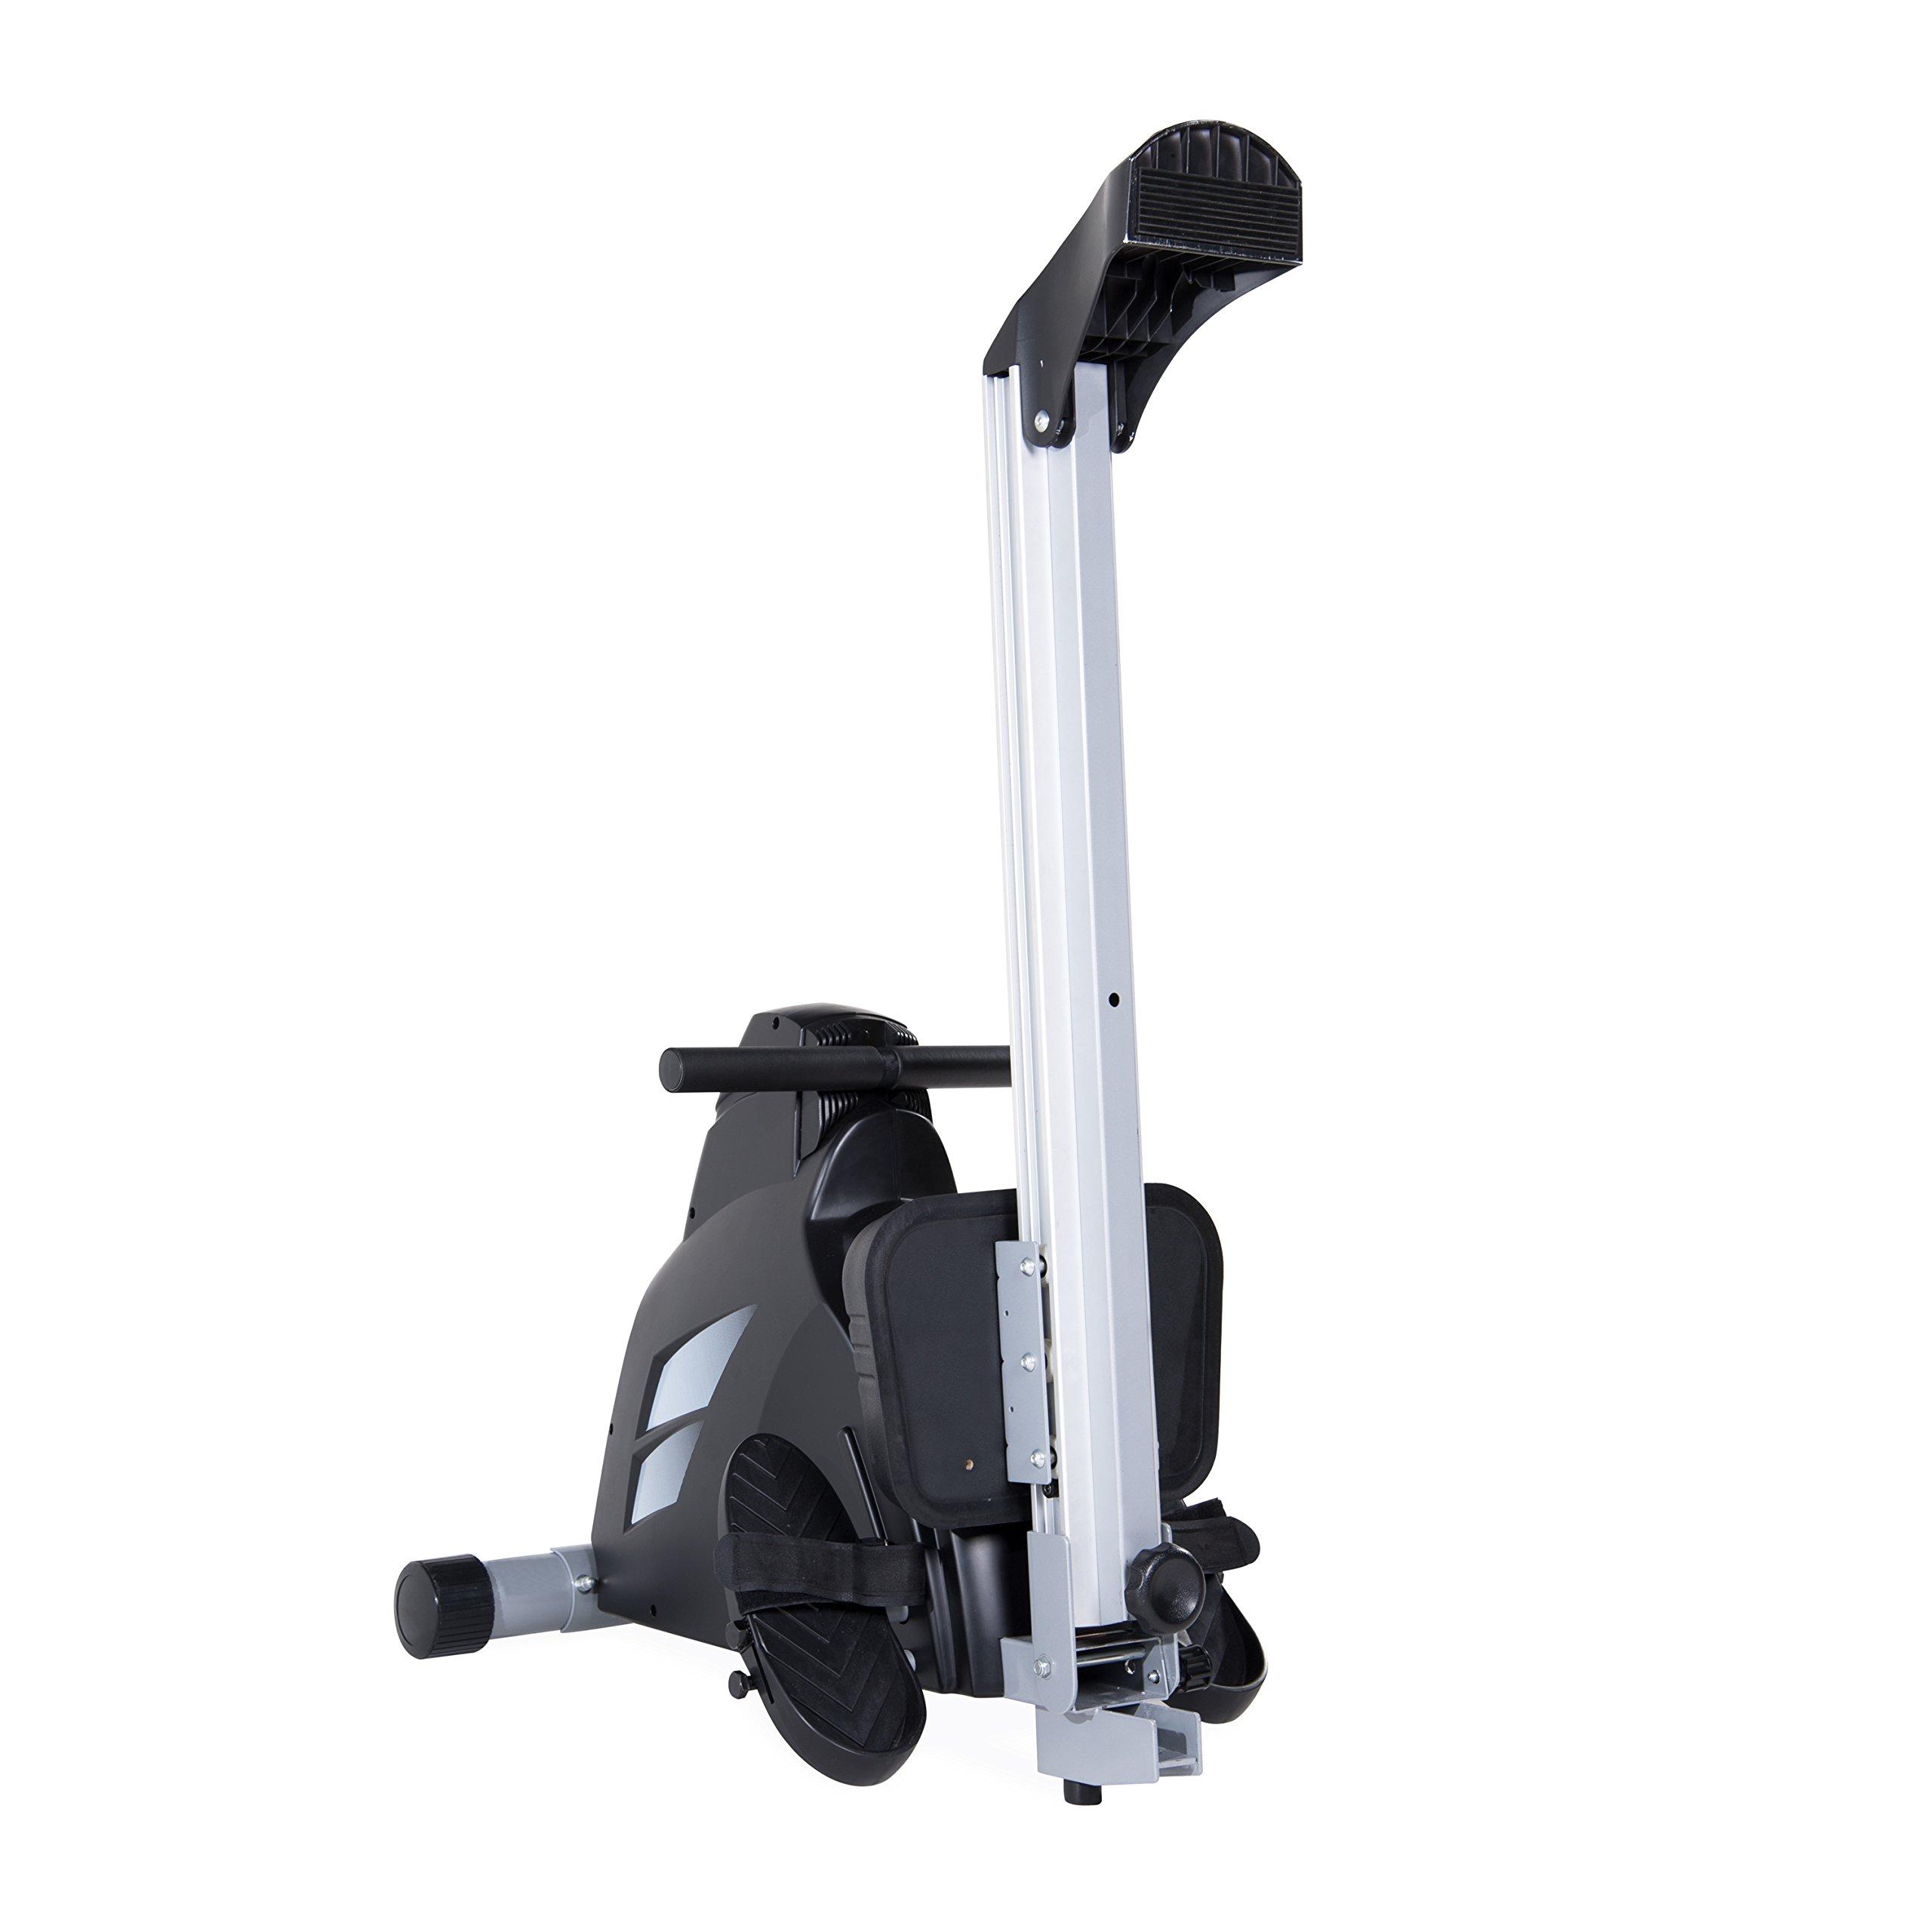 Velocity Exercise Magnetic Rower, Black by velocityexercise (Image #3)